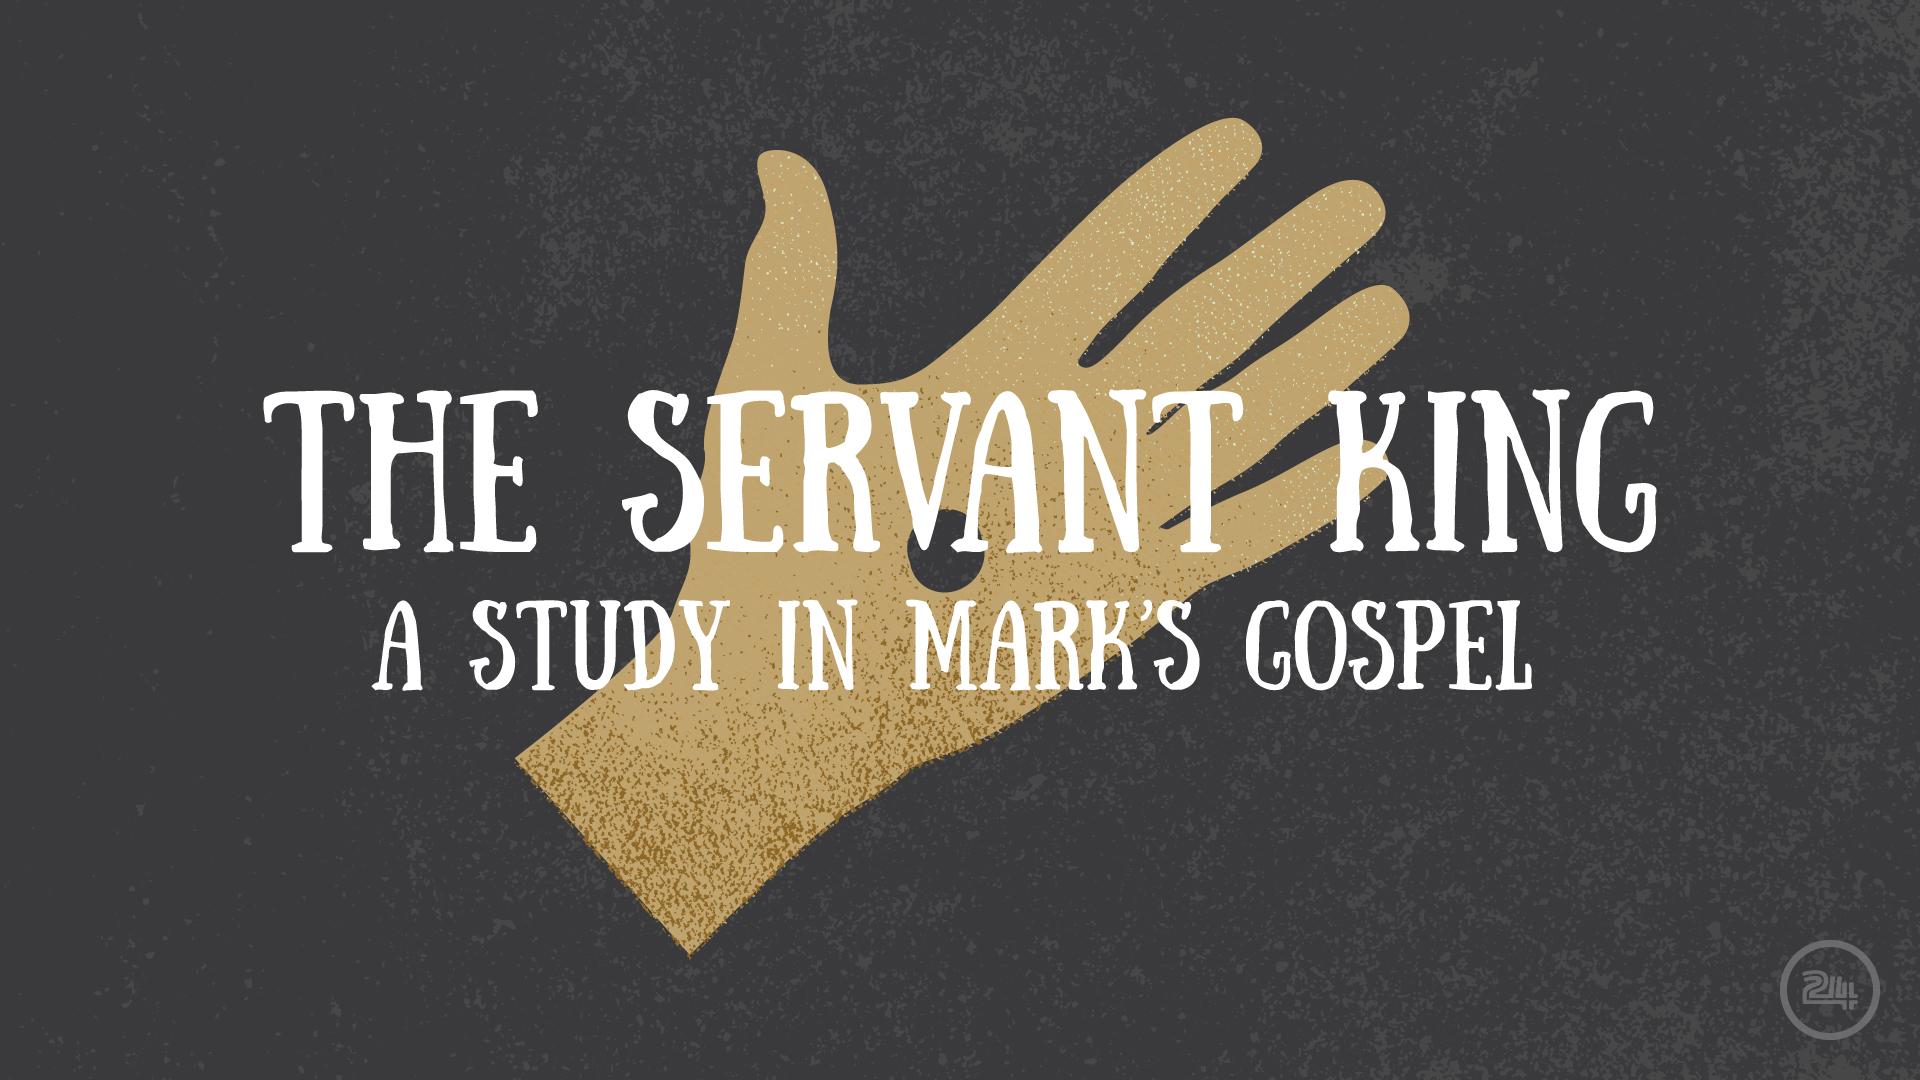 The-Servant-King-web.jpg